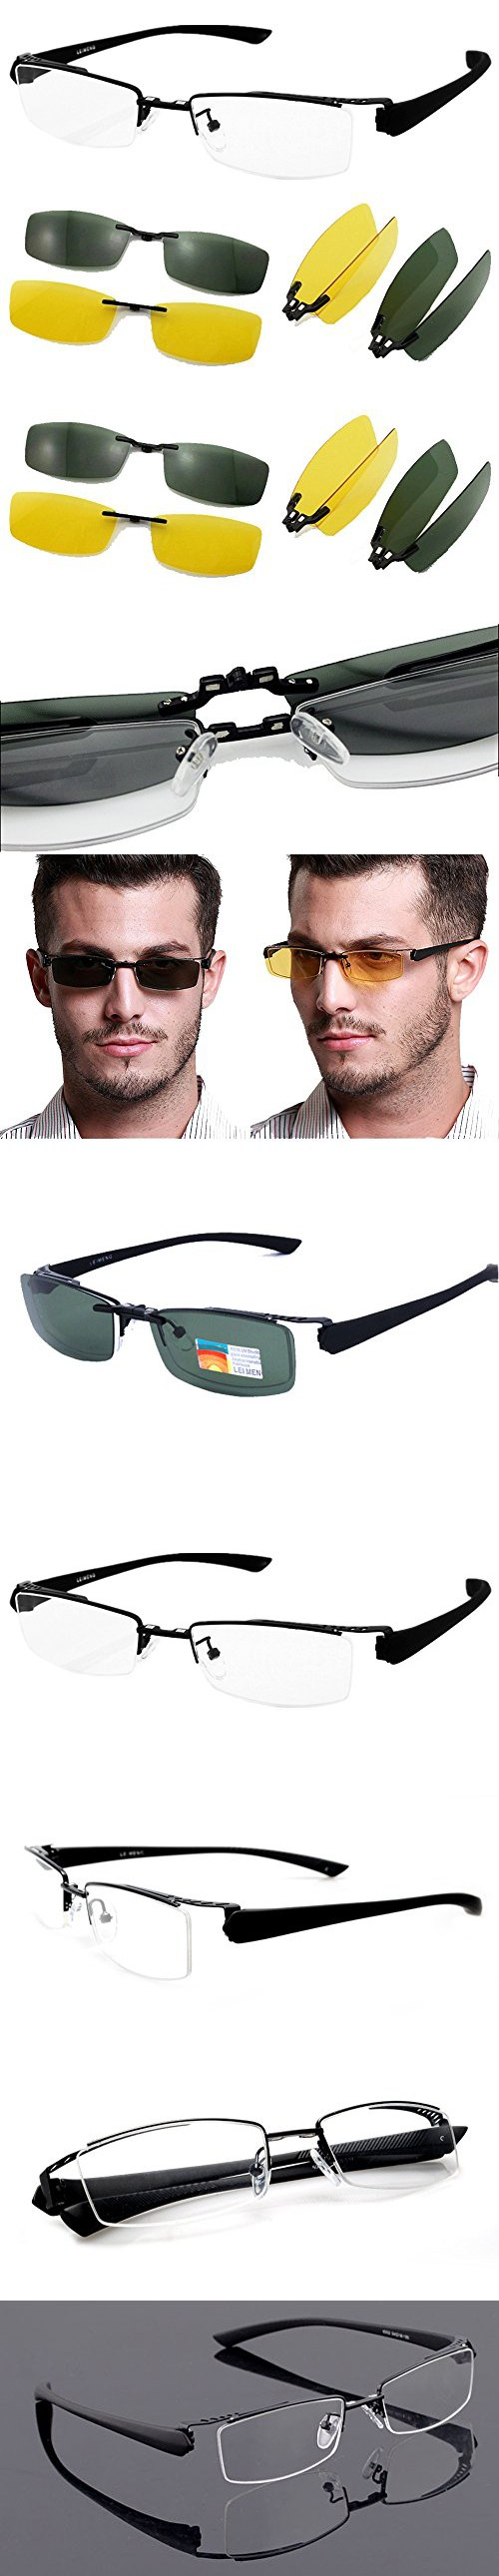 ac0e71458d8 Agstum Mens Half Rimless Myopia Glasses Frame Magnetic Clip On Sunglasses (Black  frame with 2pcs clip on